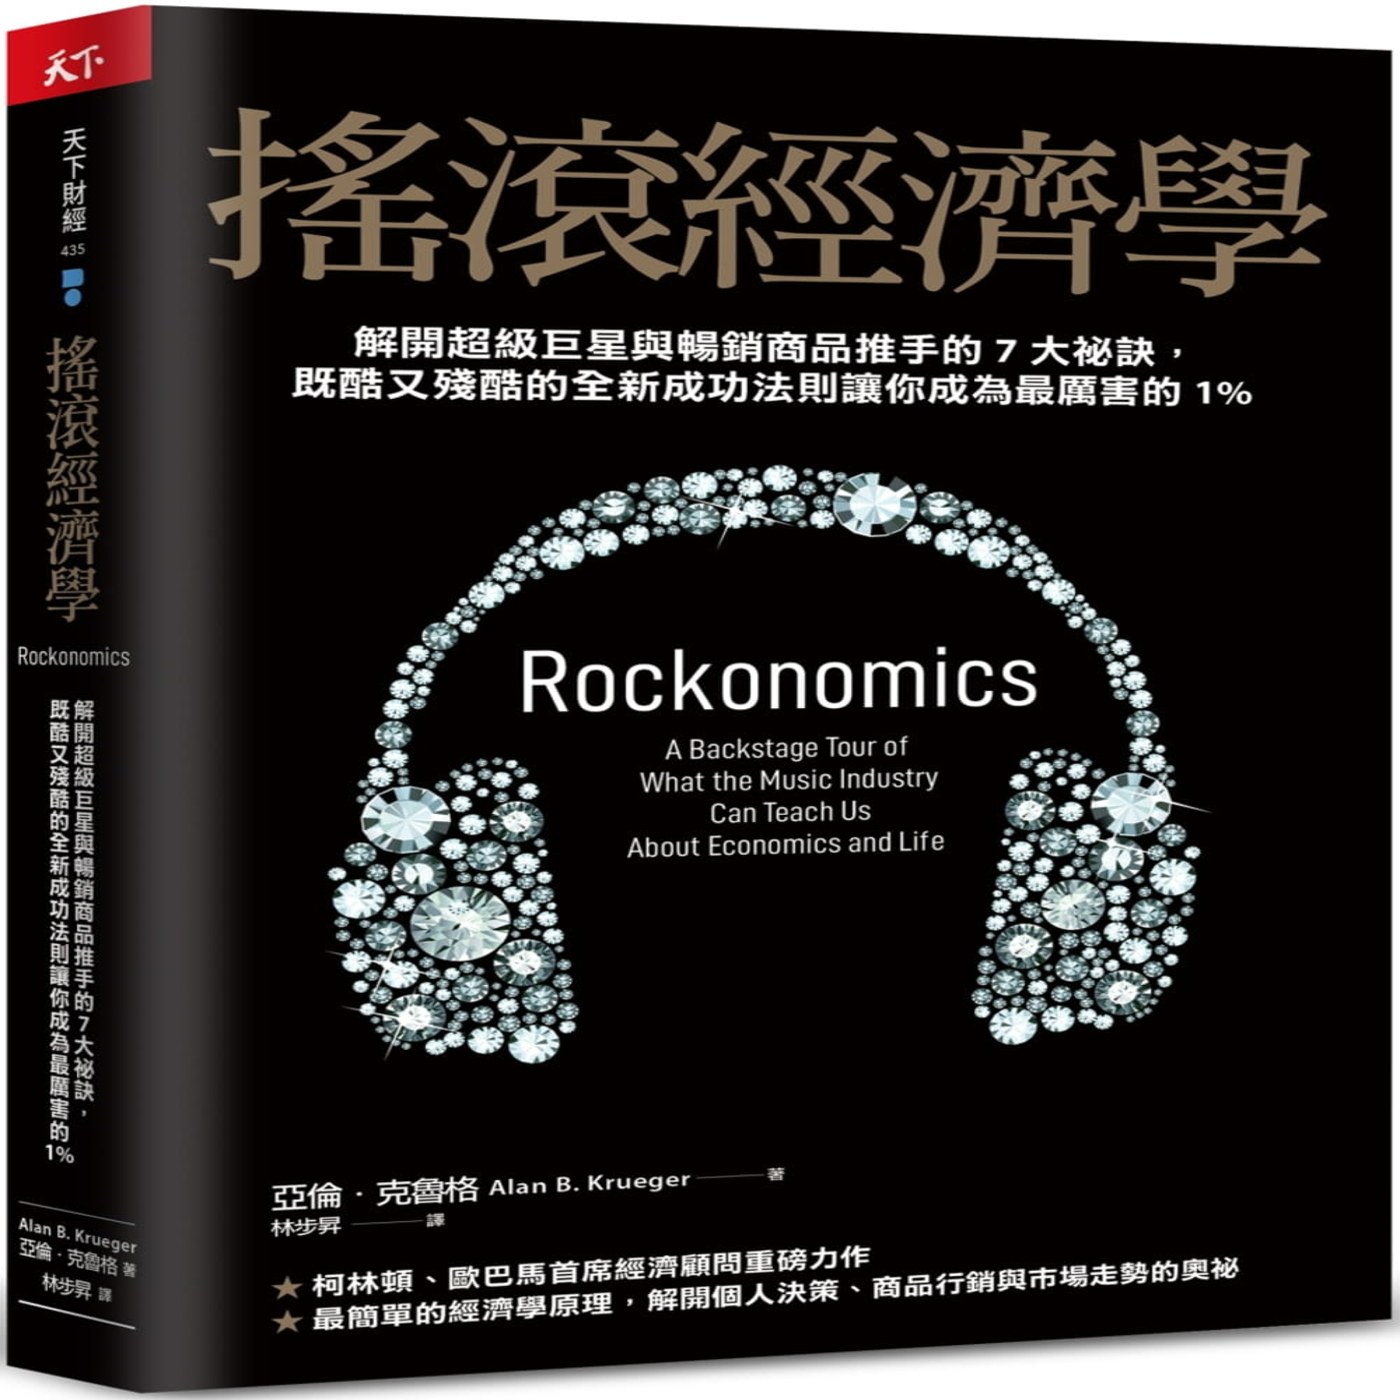 S3Ep.47 《搖滾經濟學》: 被科技打擊, 又被科技所拯救的音樂產業